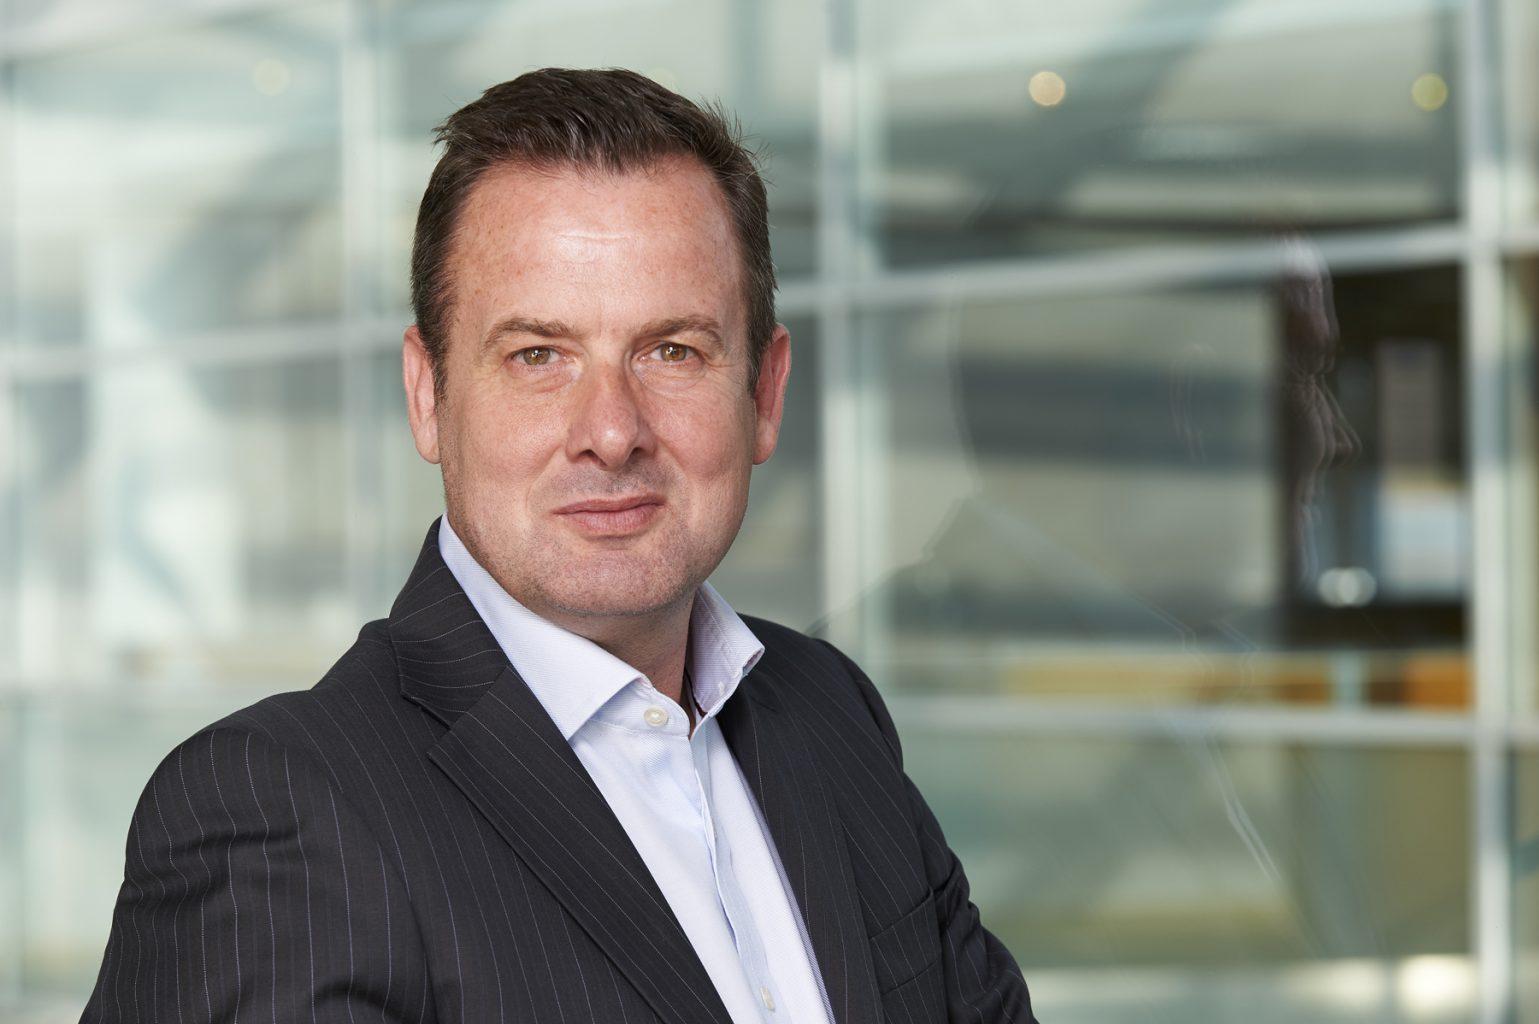 Tony Webb corporate headshot for Juniper Networks